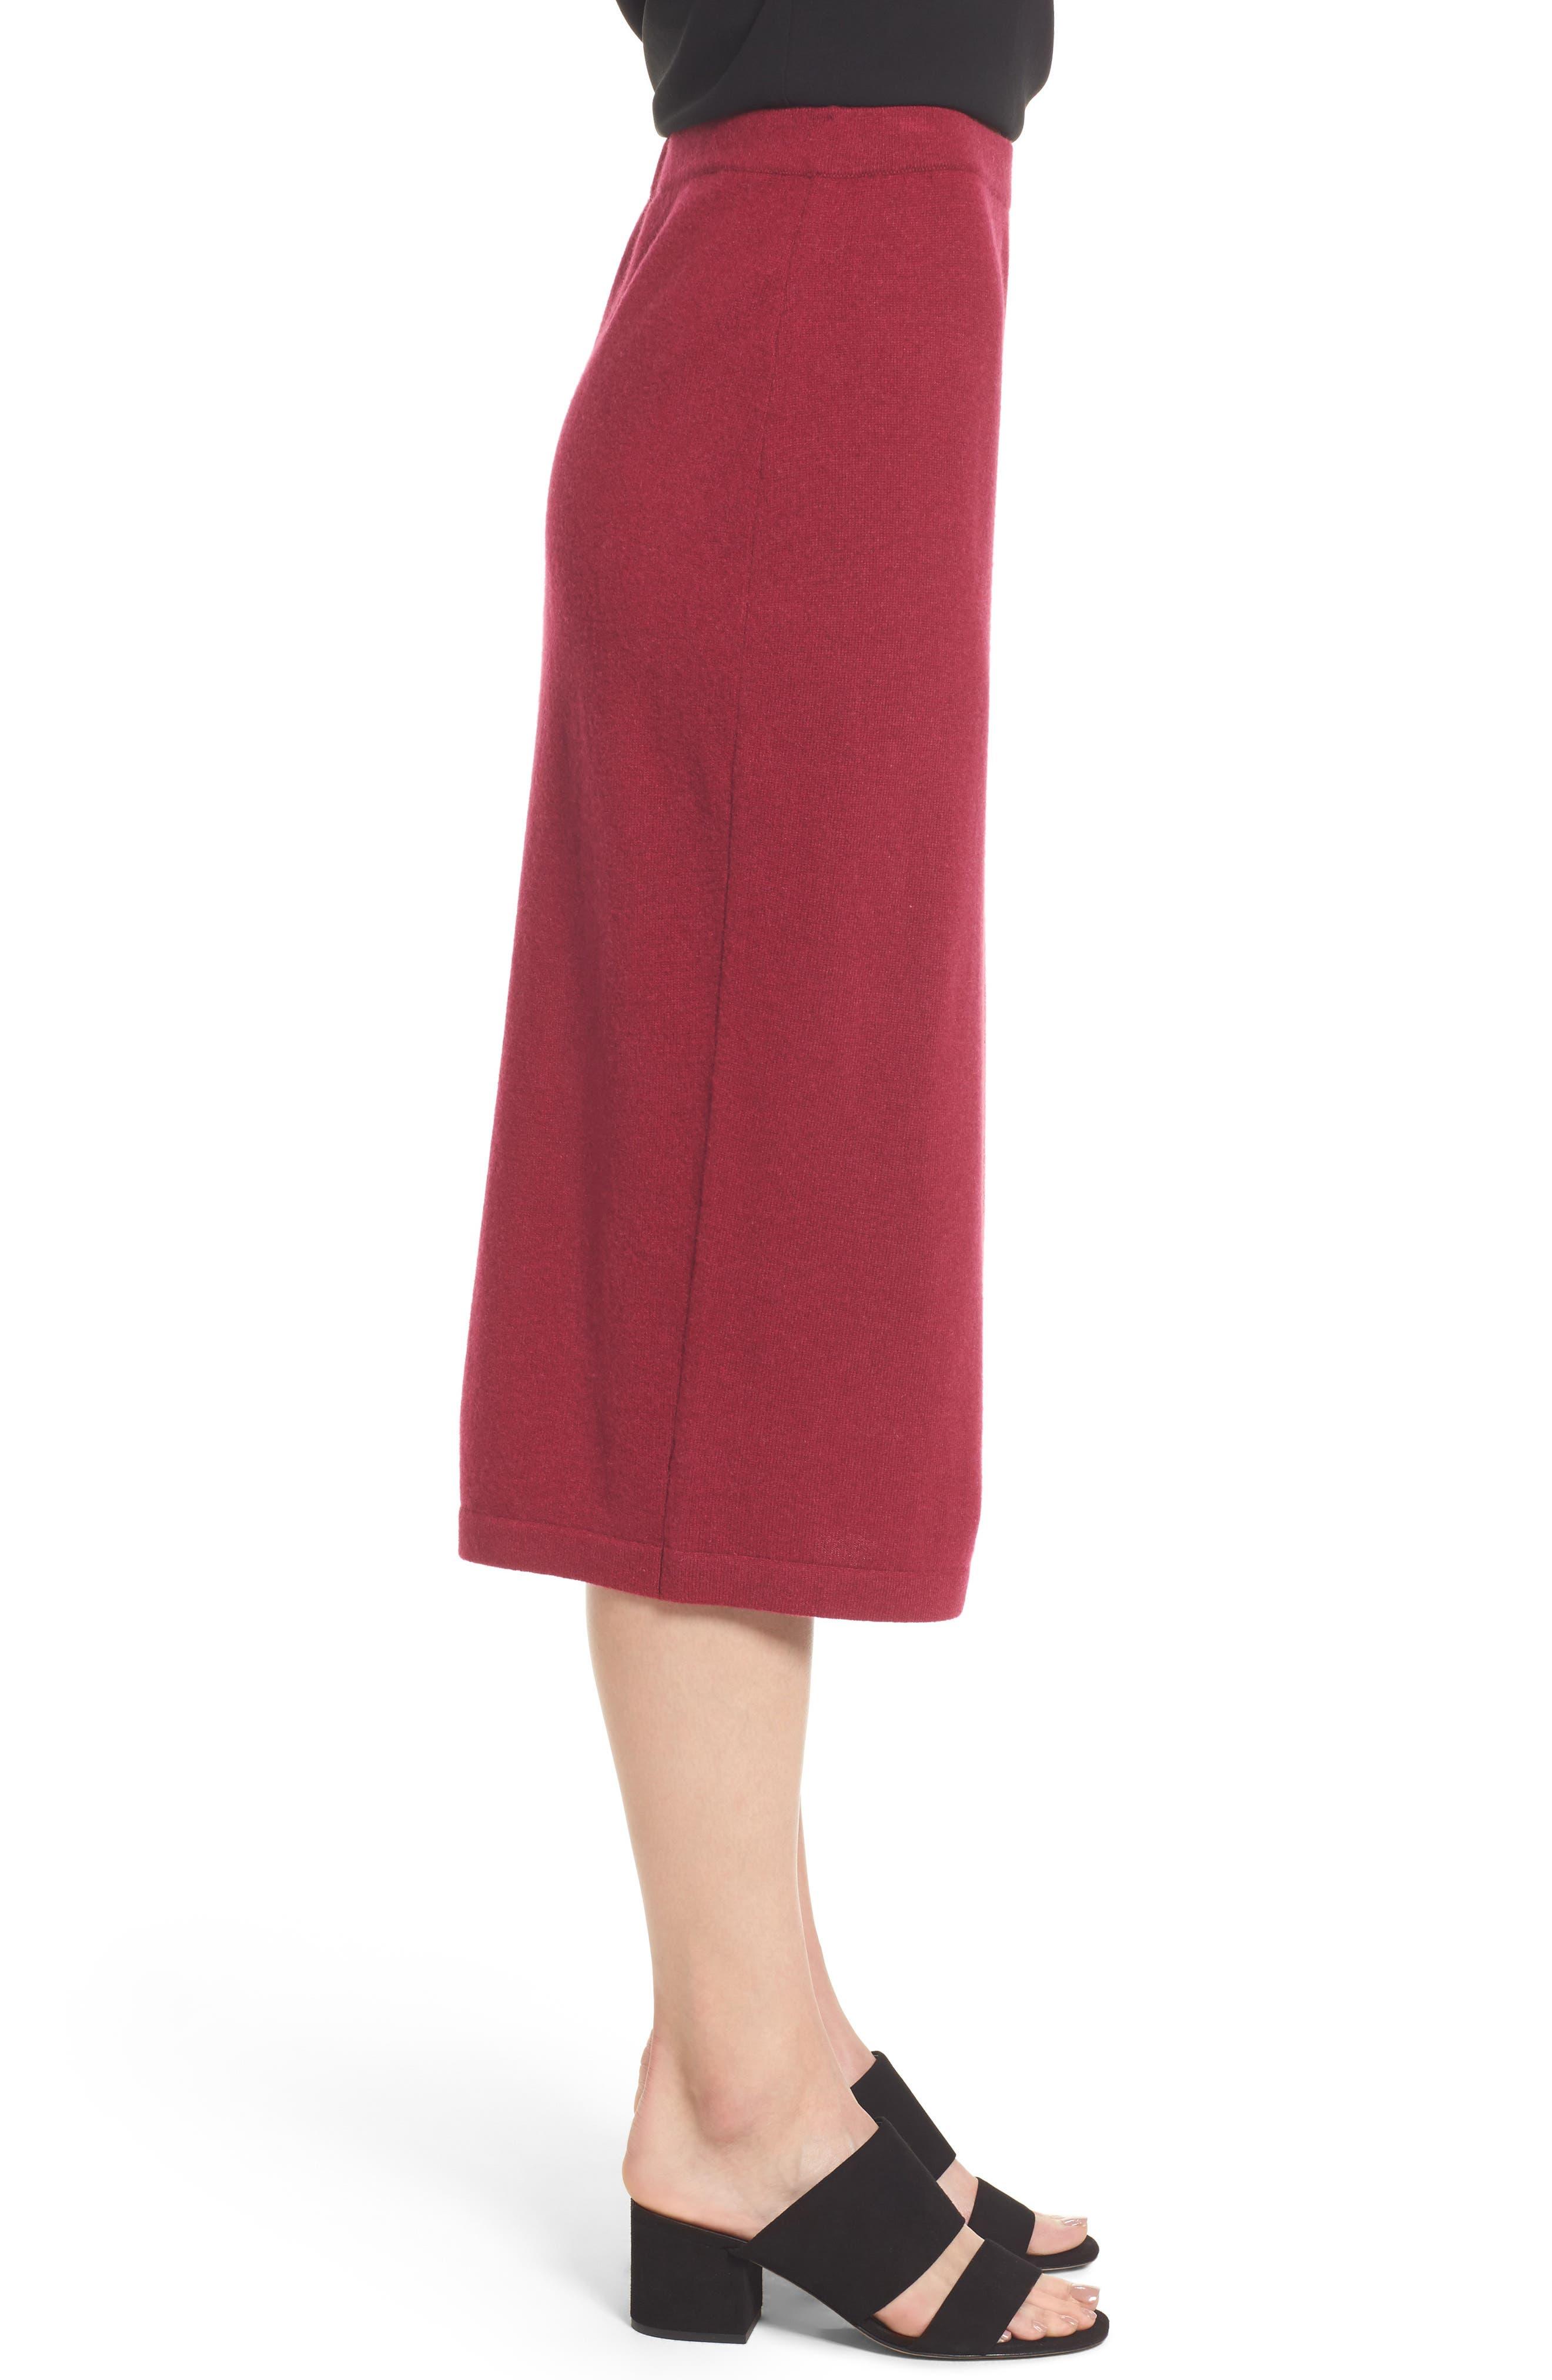 Cashmere Knit Pencil Skirt,                             Alternate thumbnail 3, color,                             Hibiscus